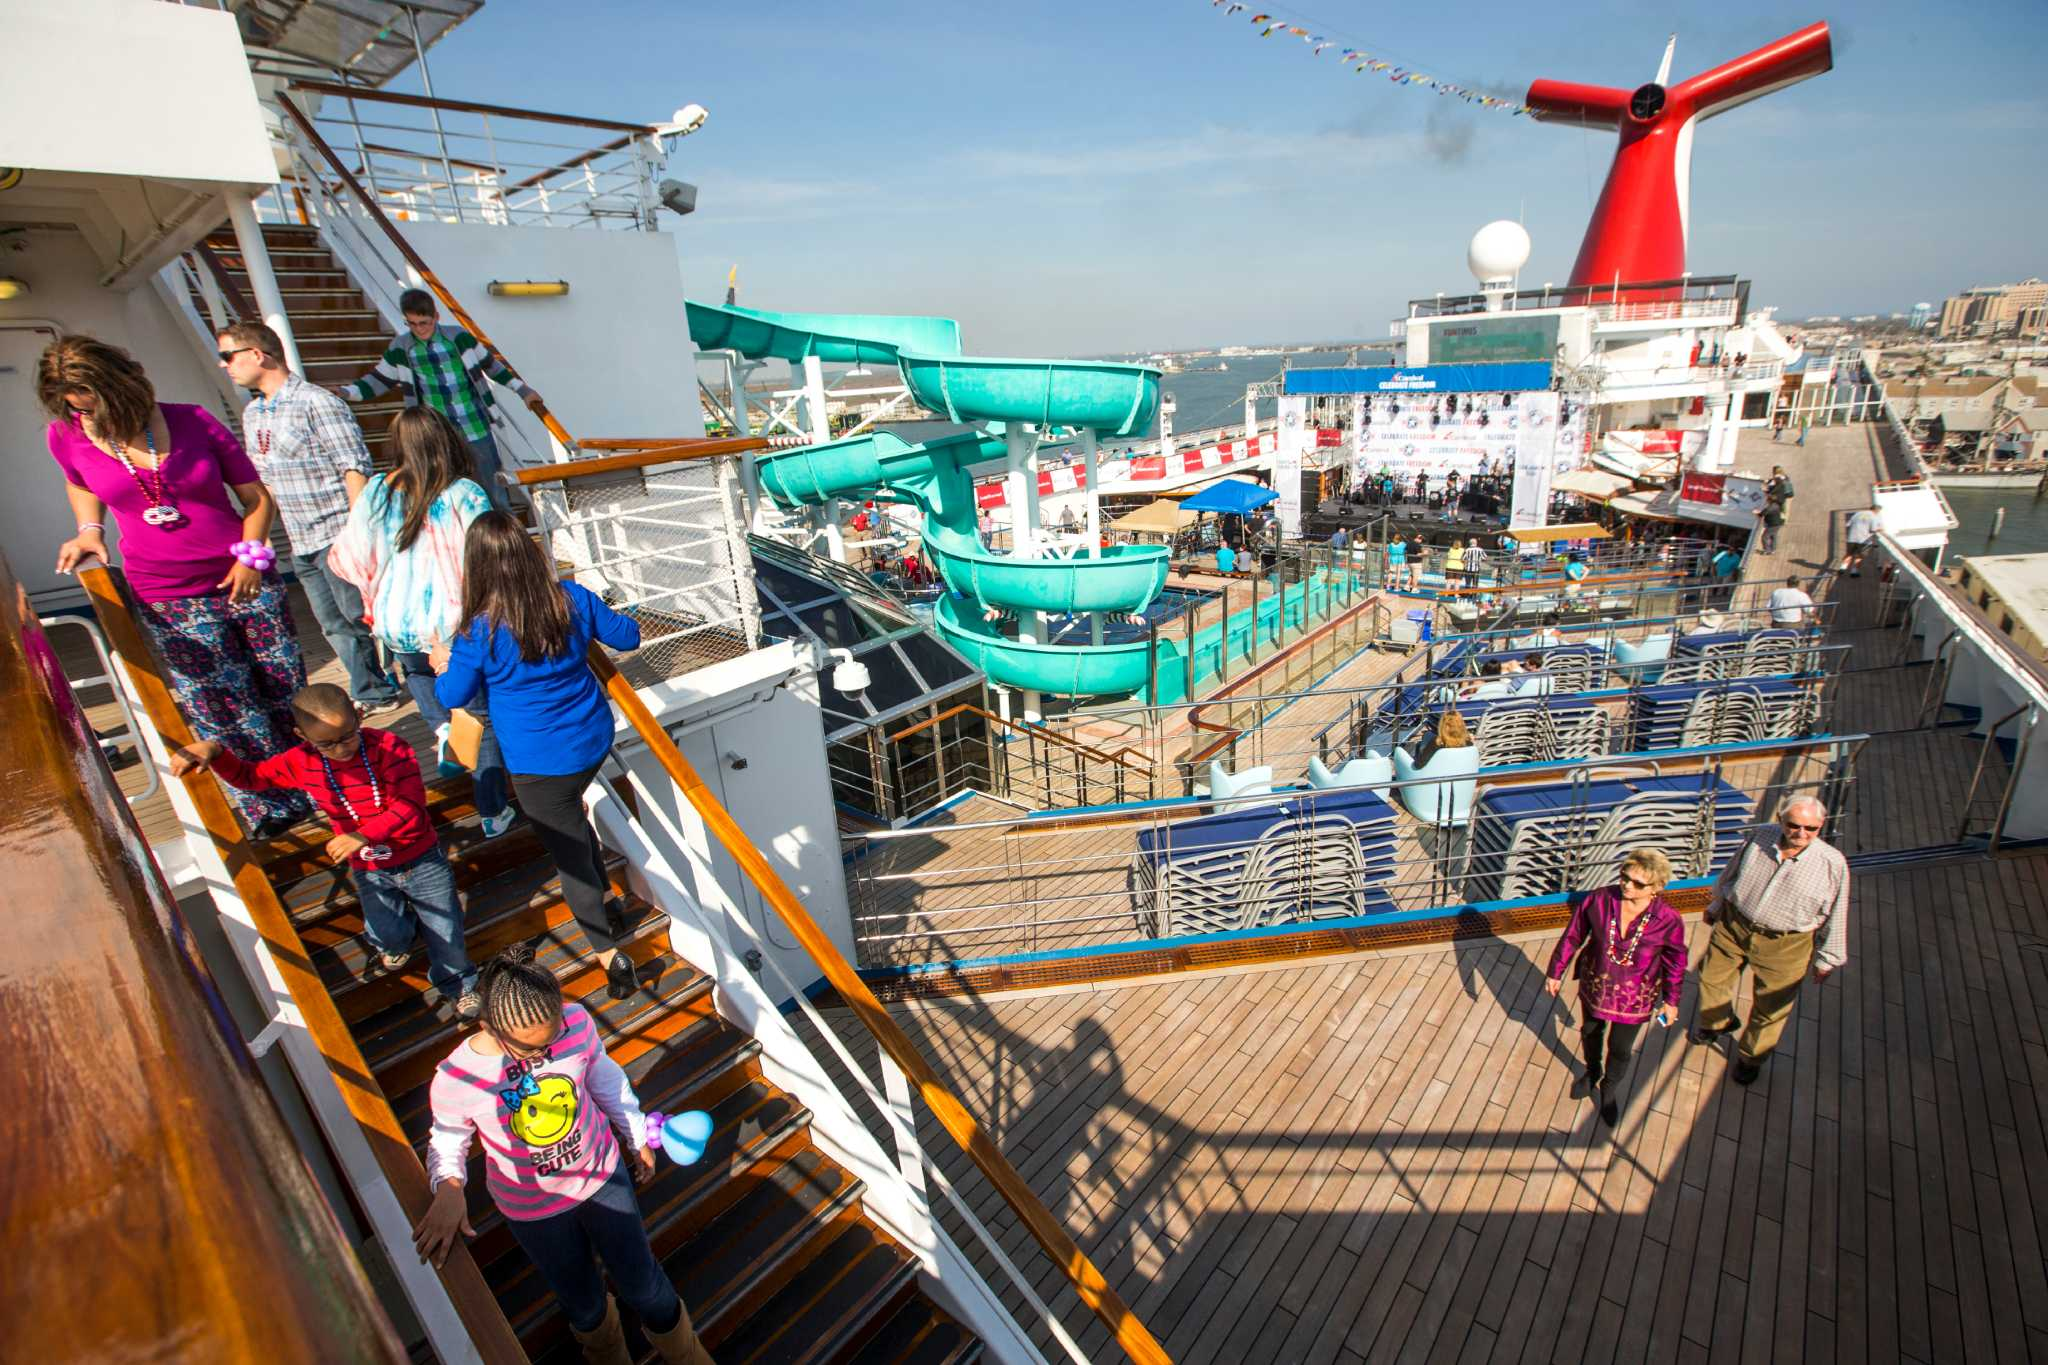 Cruise ships on coronavirus: Do not board if you've been to China